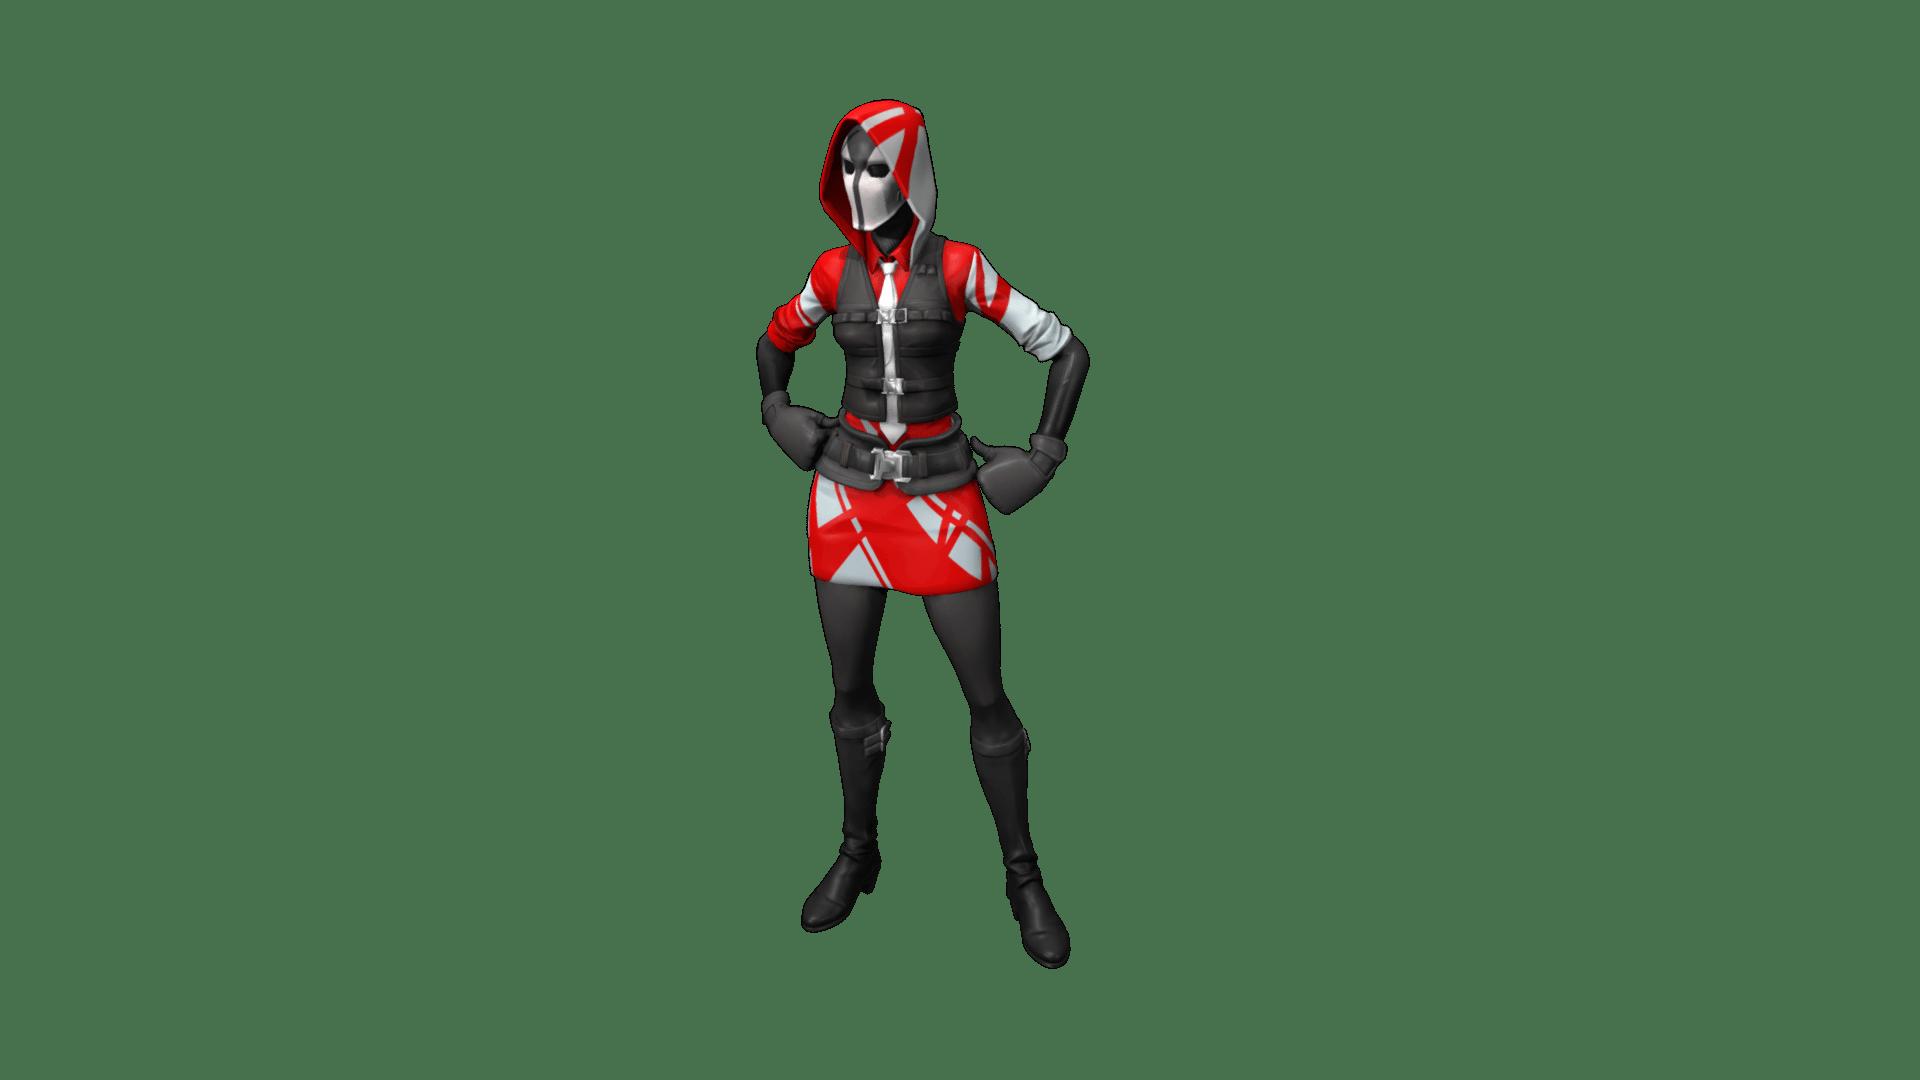 The Ace - The Ace (Молния)